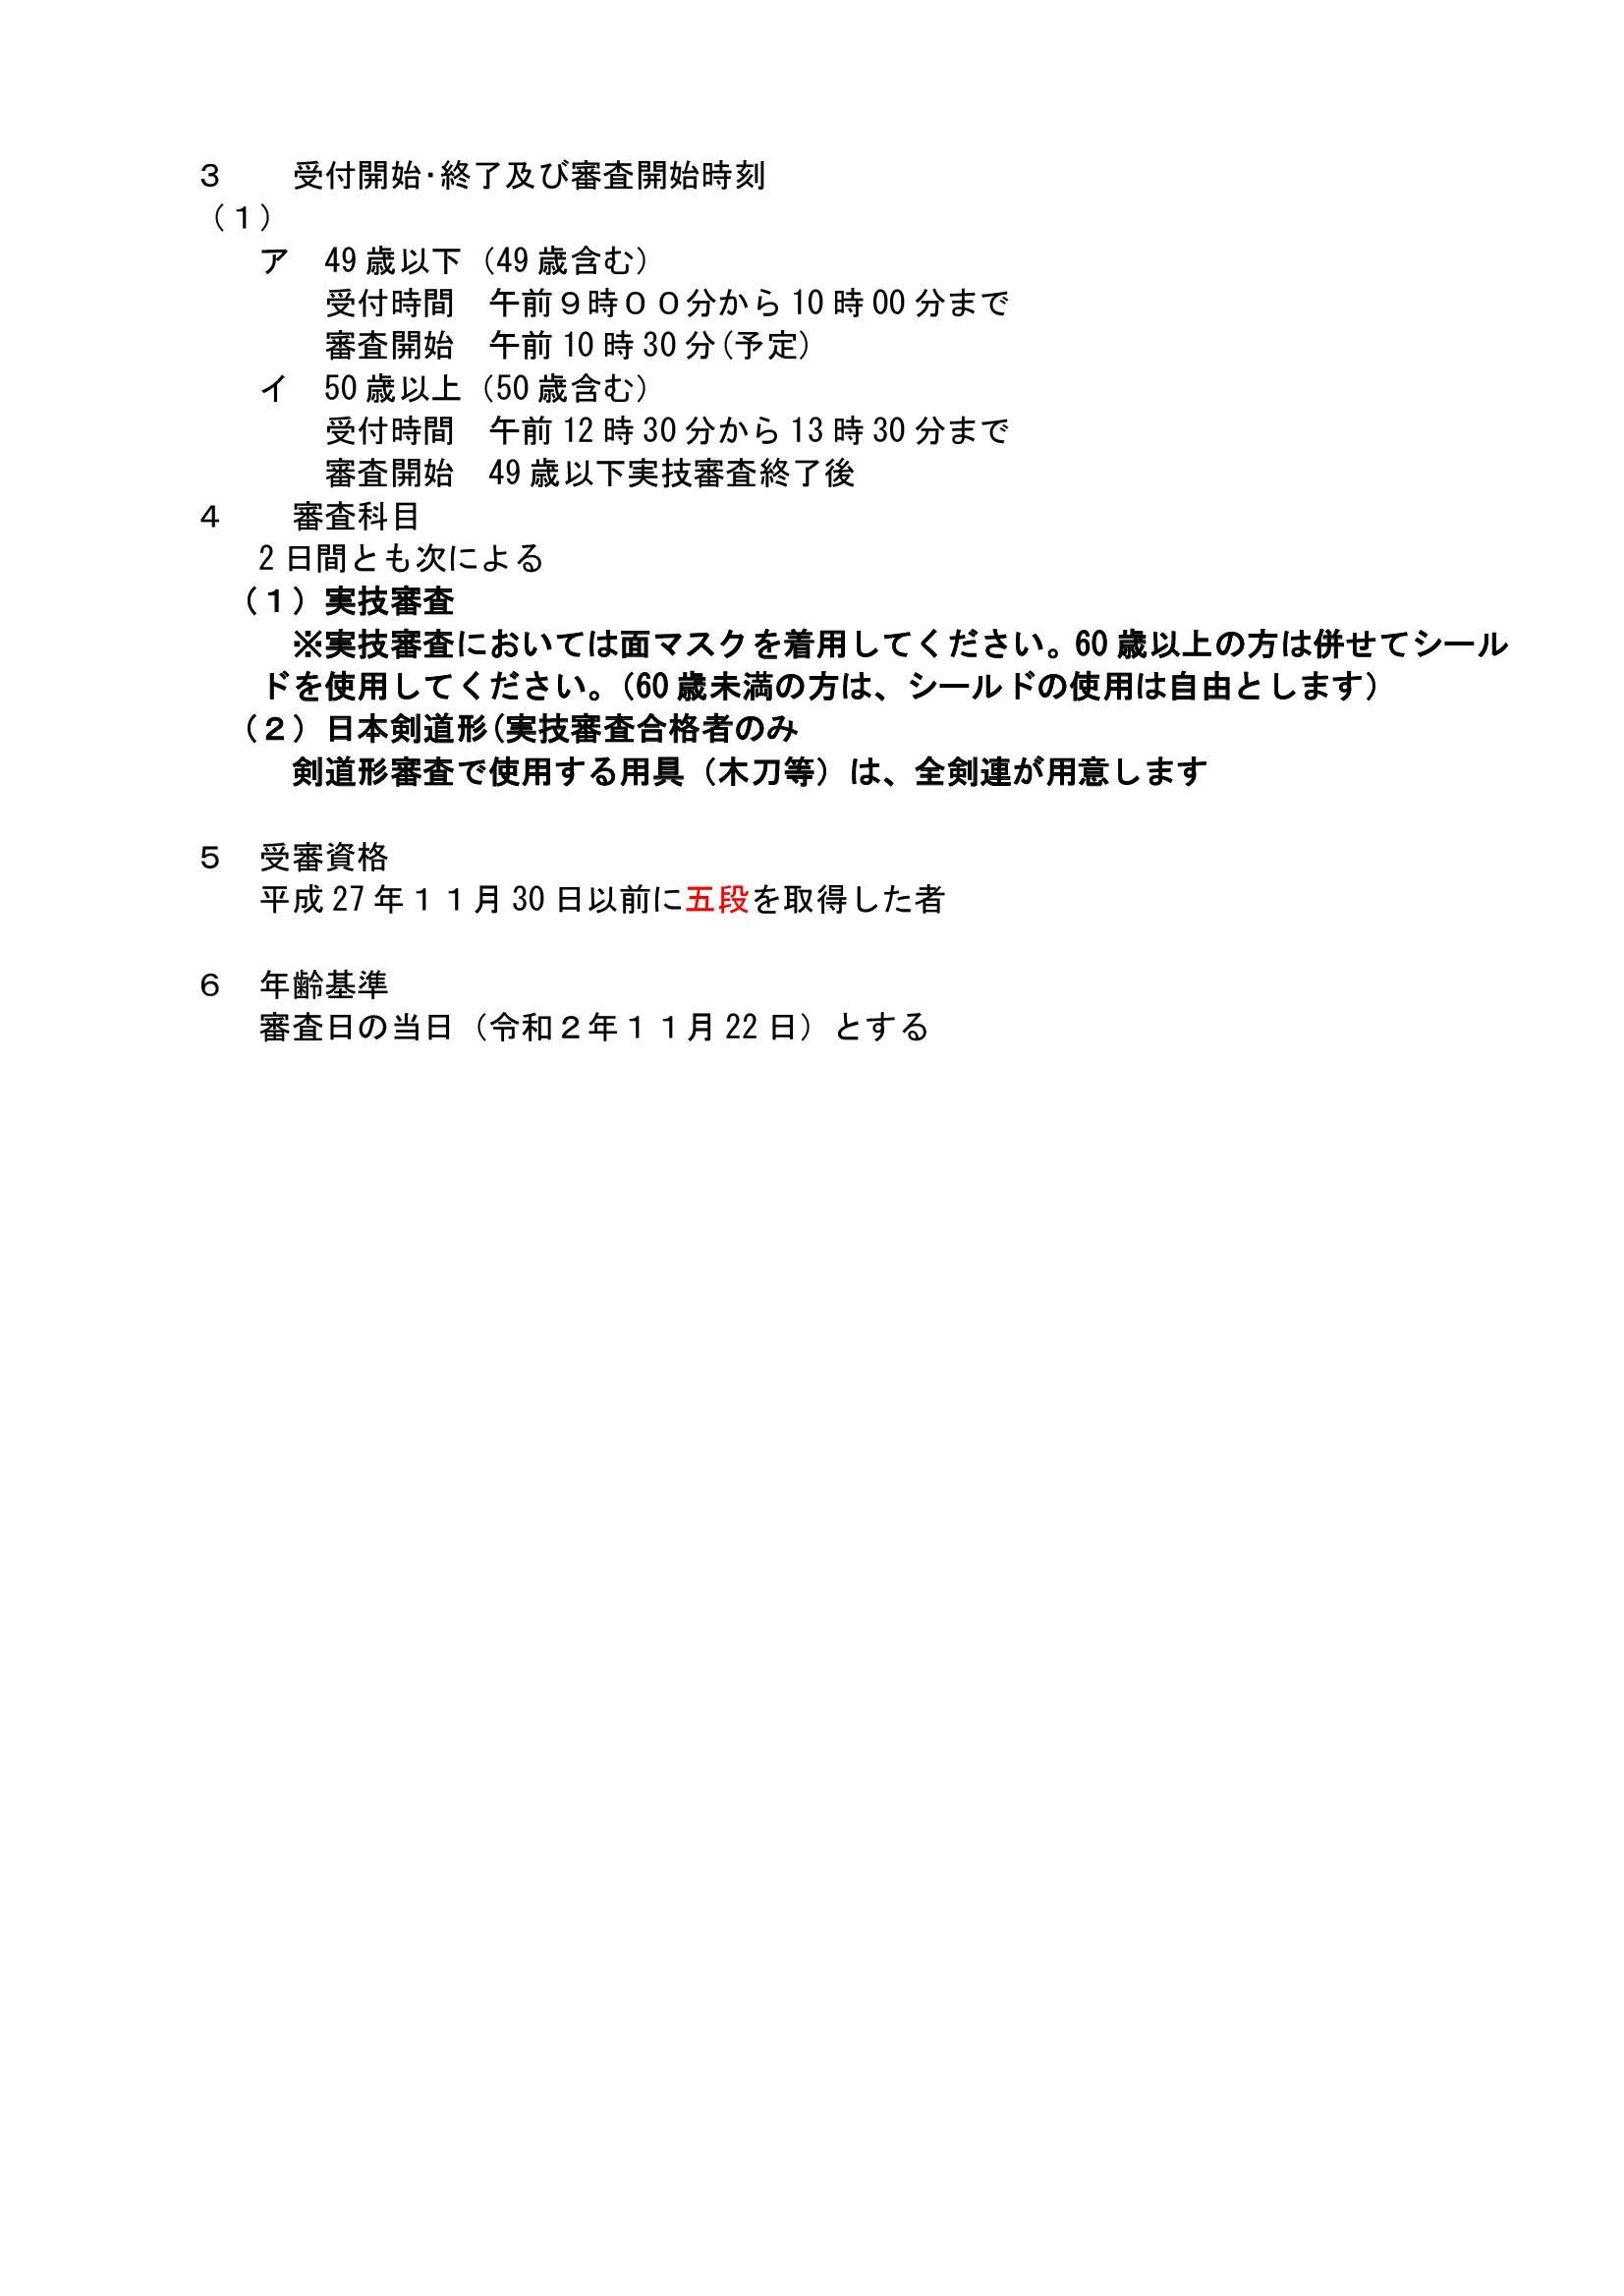 R2年11月六・七・八段審査会の実施について 東京、愛知_0004